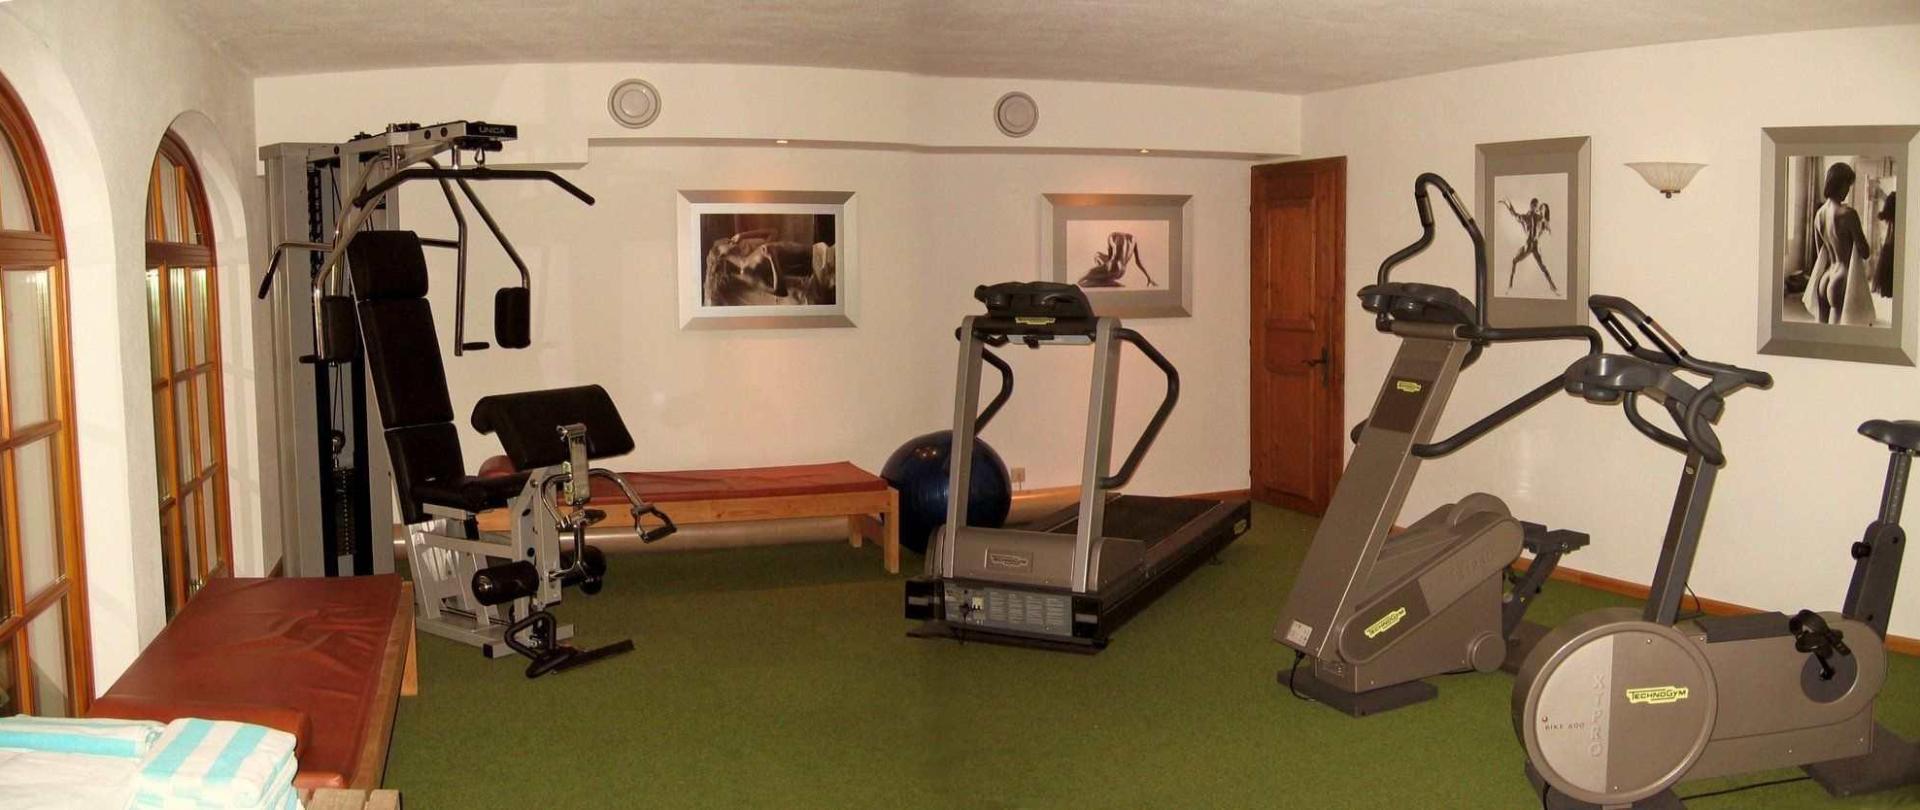 fitness2-1.jpg